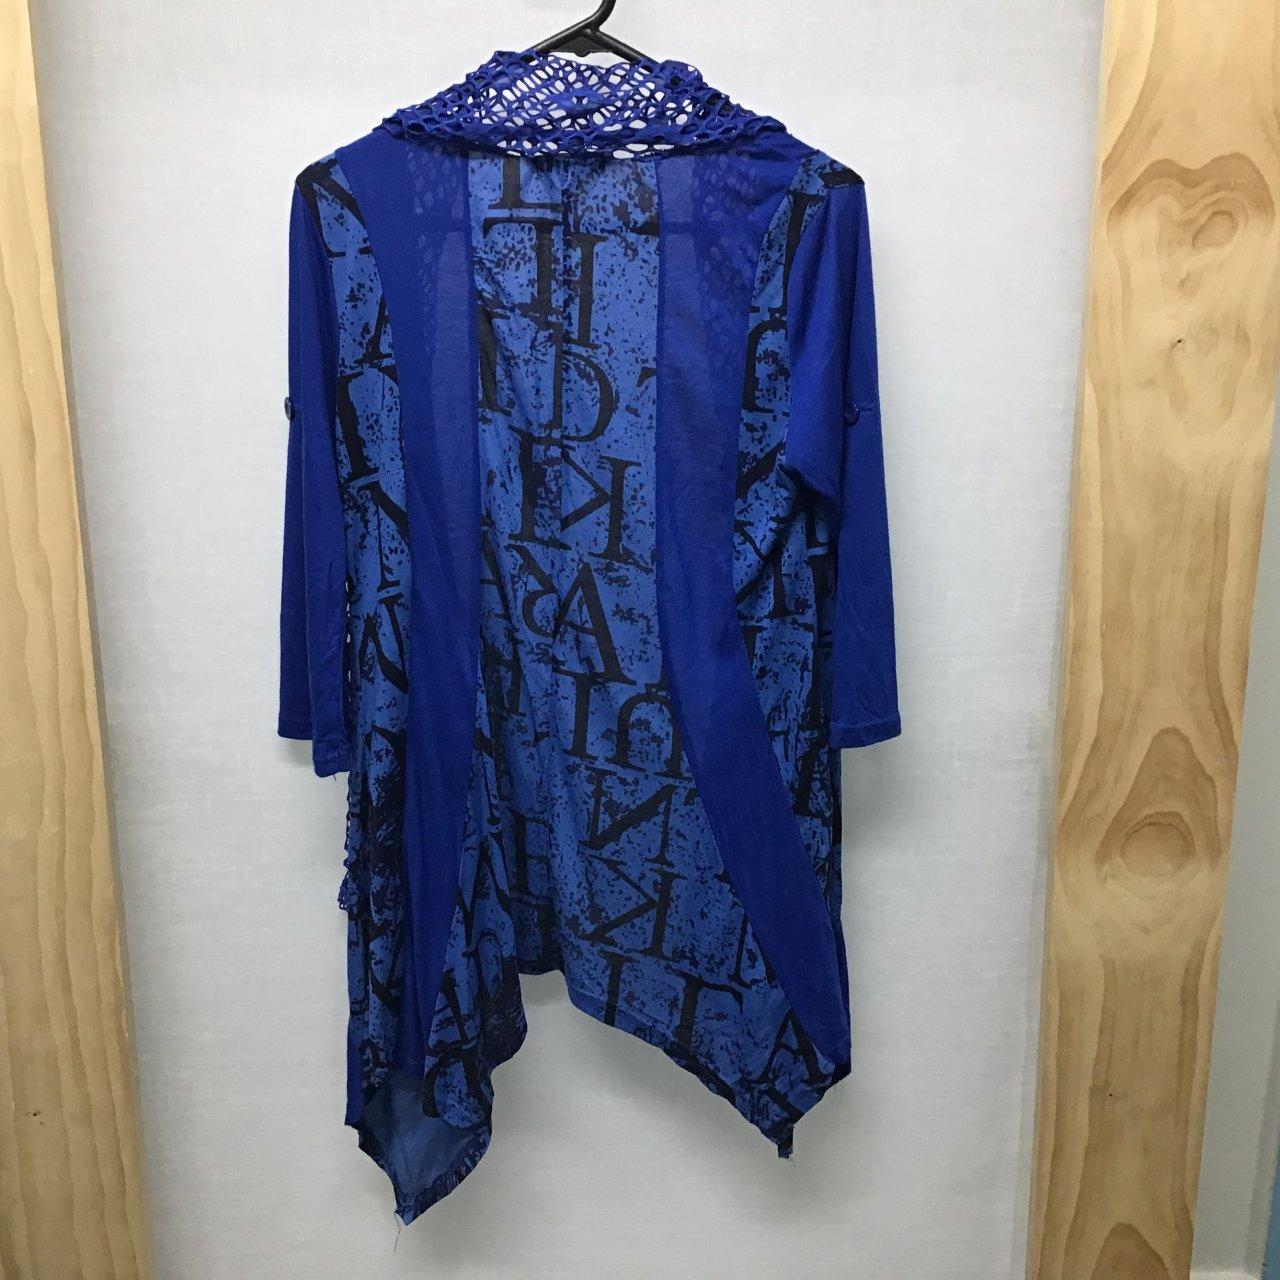 Caroline Morgan, Blue and black cardigan, Size 10